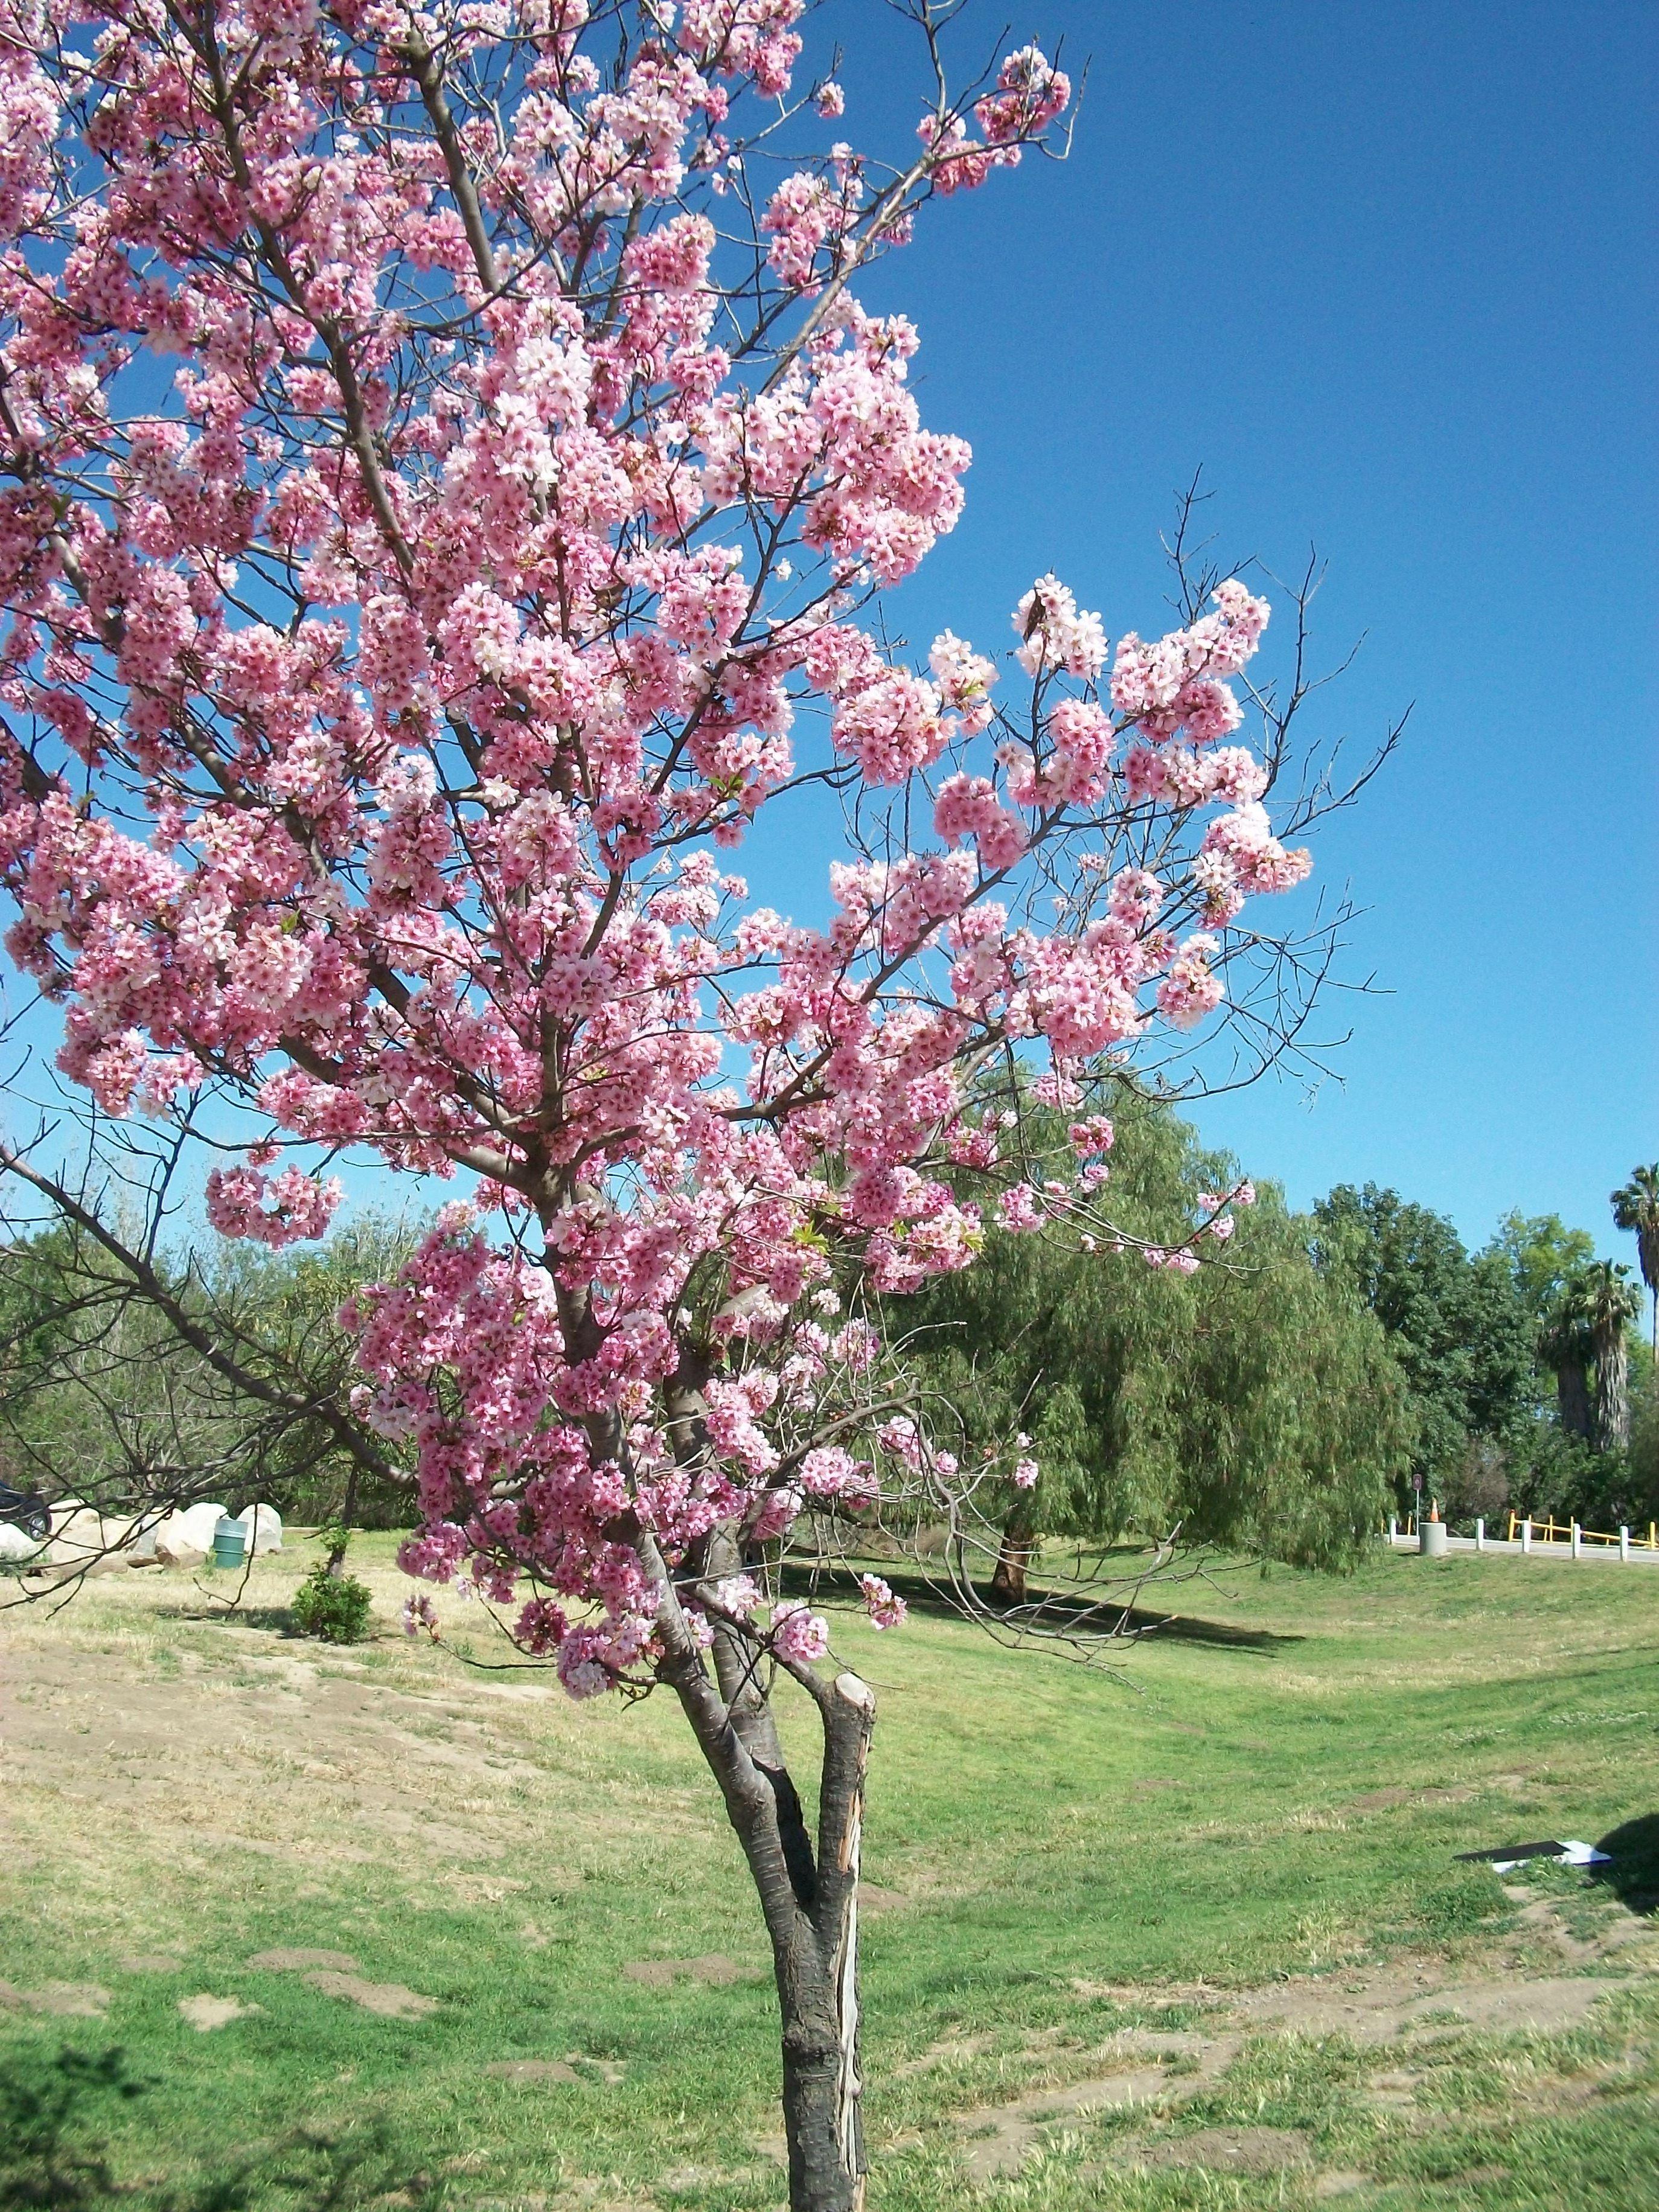 Cherry Blossoms Bloom On A Beautiful May Afternoon In 2018 At Lake Balboa Anthony C Beilenson Park In Southern California Lakebalboa Lake Balboa Balboa Lake